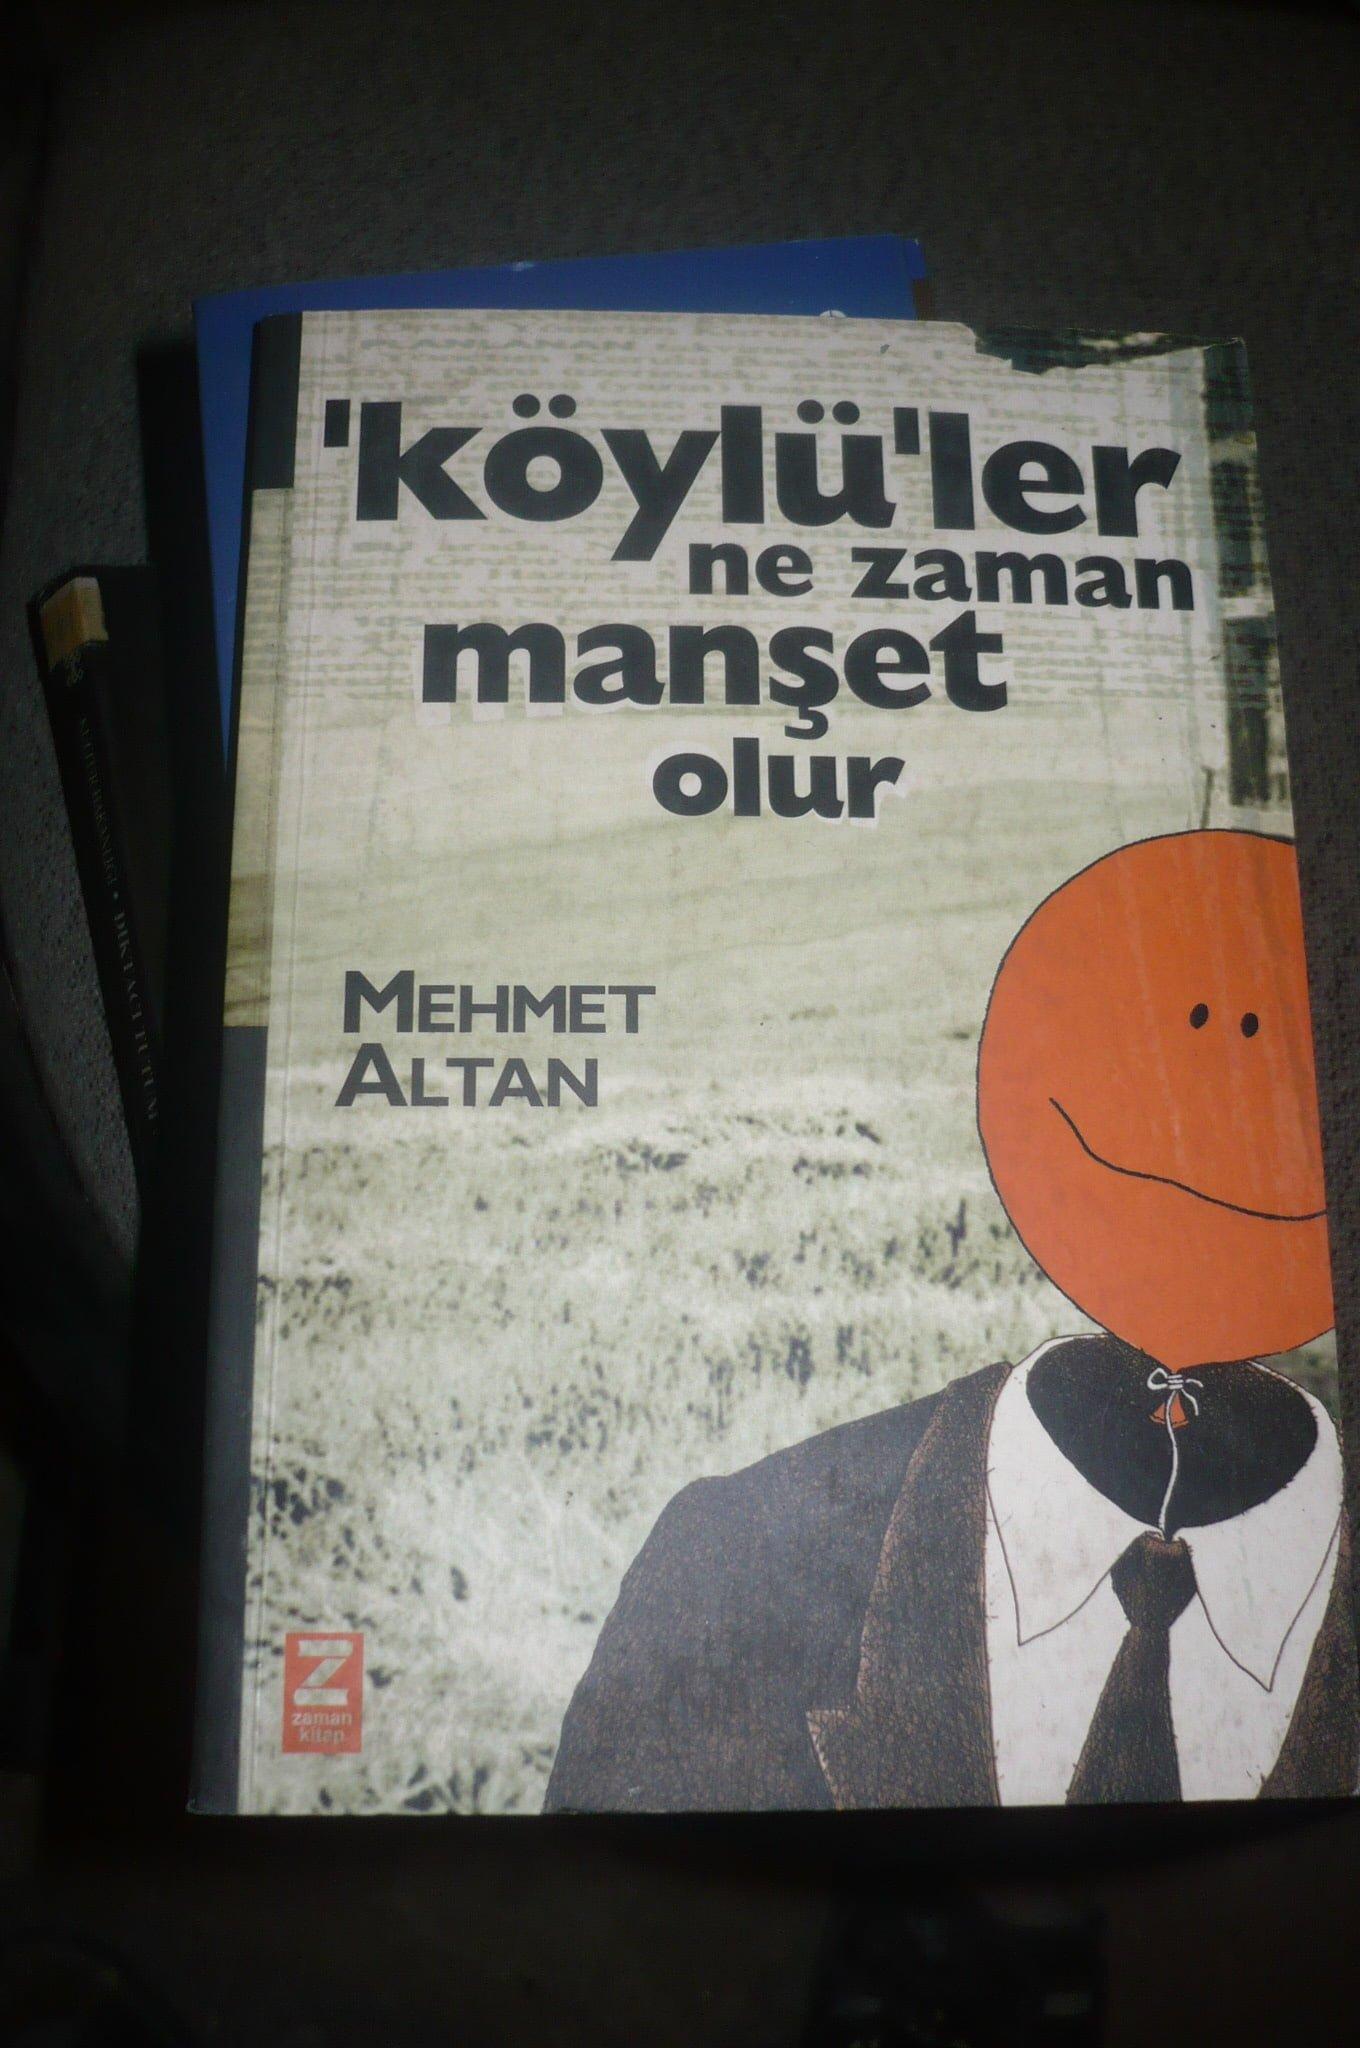 Köylüler ne zaman manşet olur/Mehmet Altan/15 tl